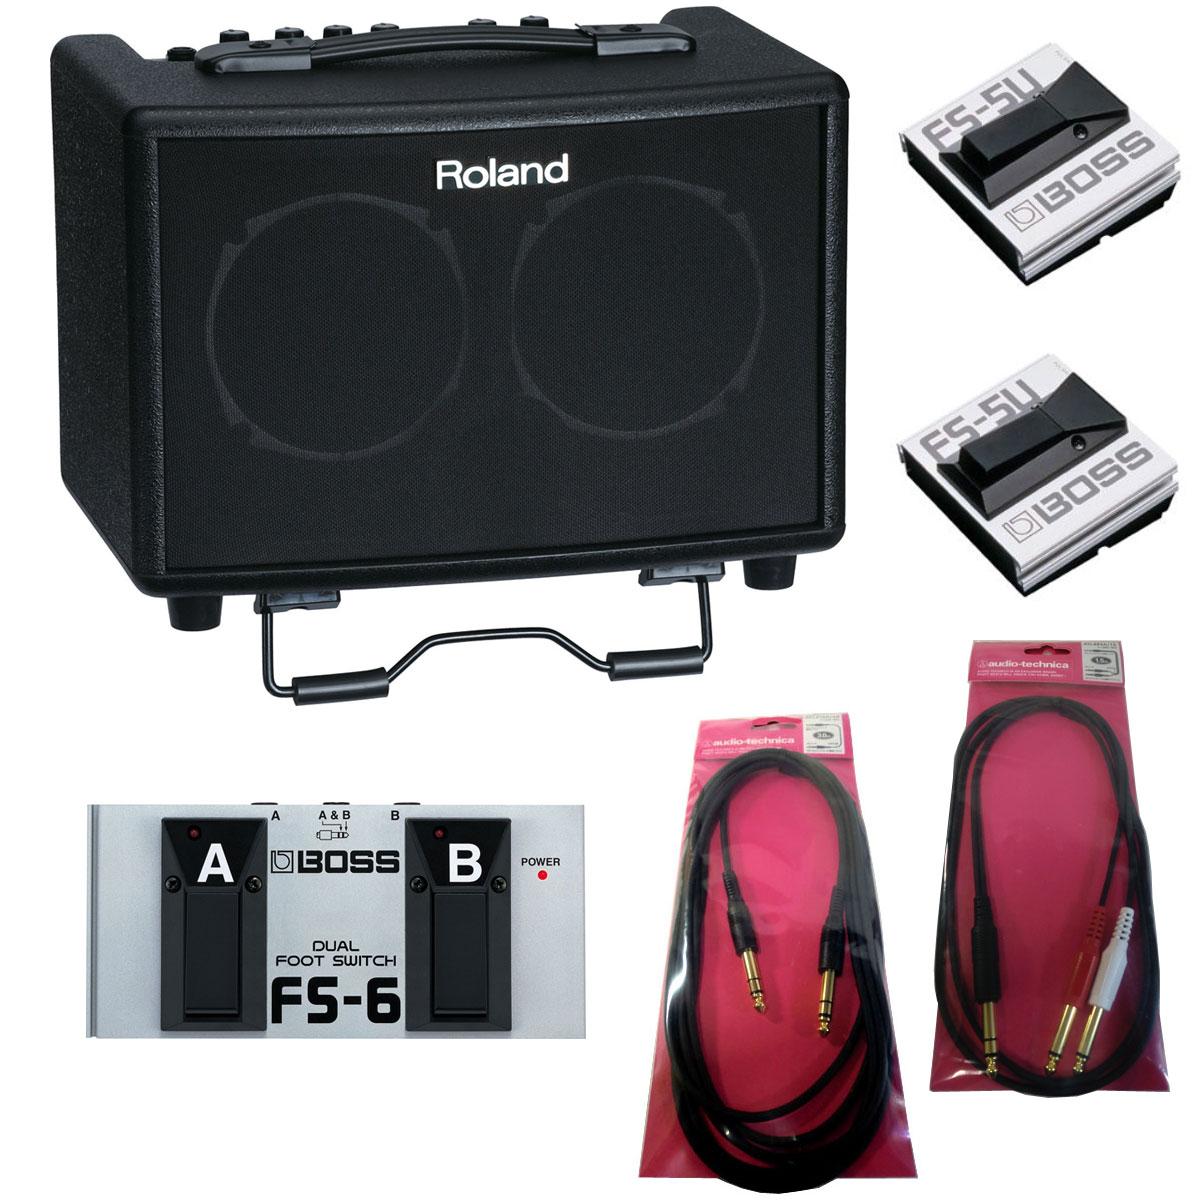 Roland / AC-33 Acoustic Chorus 【BOSS FS-6/FS-5Uつき!】【スタンダードセット】【アコースティックギター用アンプ/電池駆動可能】【15W+15W ステレオ仕様】【YRK】